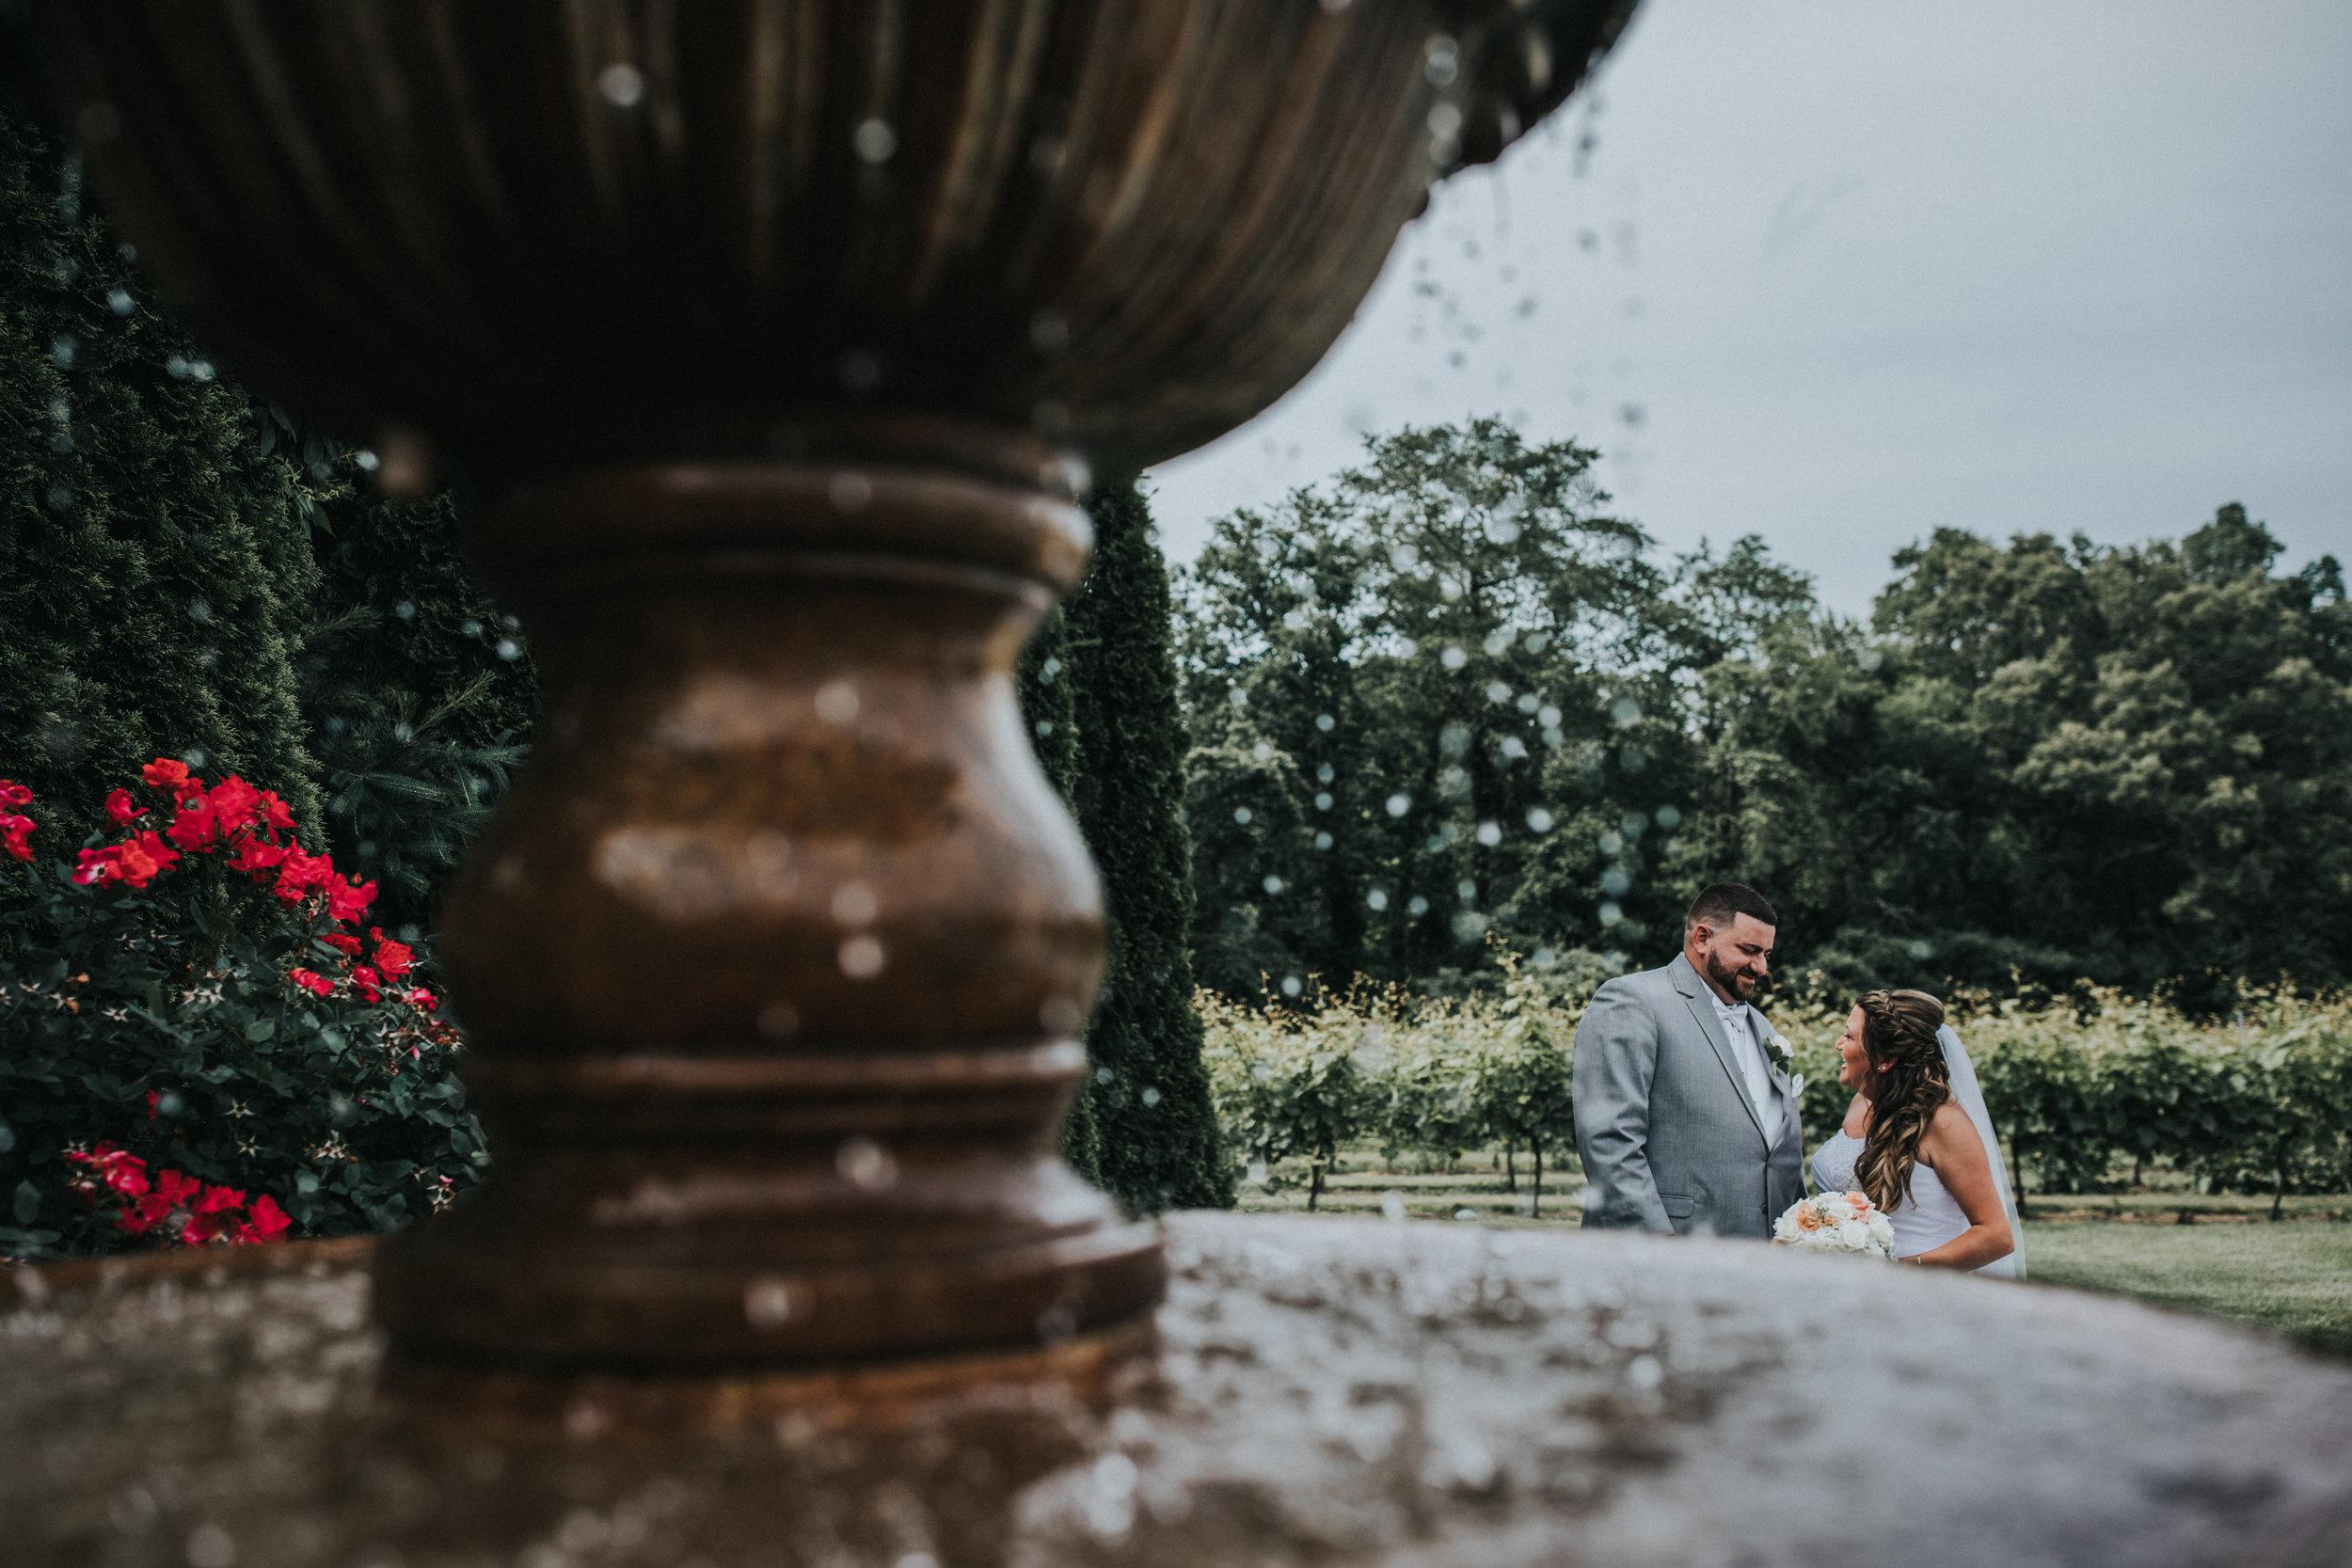 New-Jersey-Wedding-Photographer-JennaLynnPhotography-ValenzanoWinery-FirstLook-12.jpg